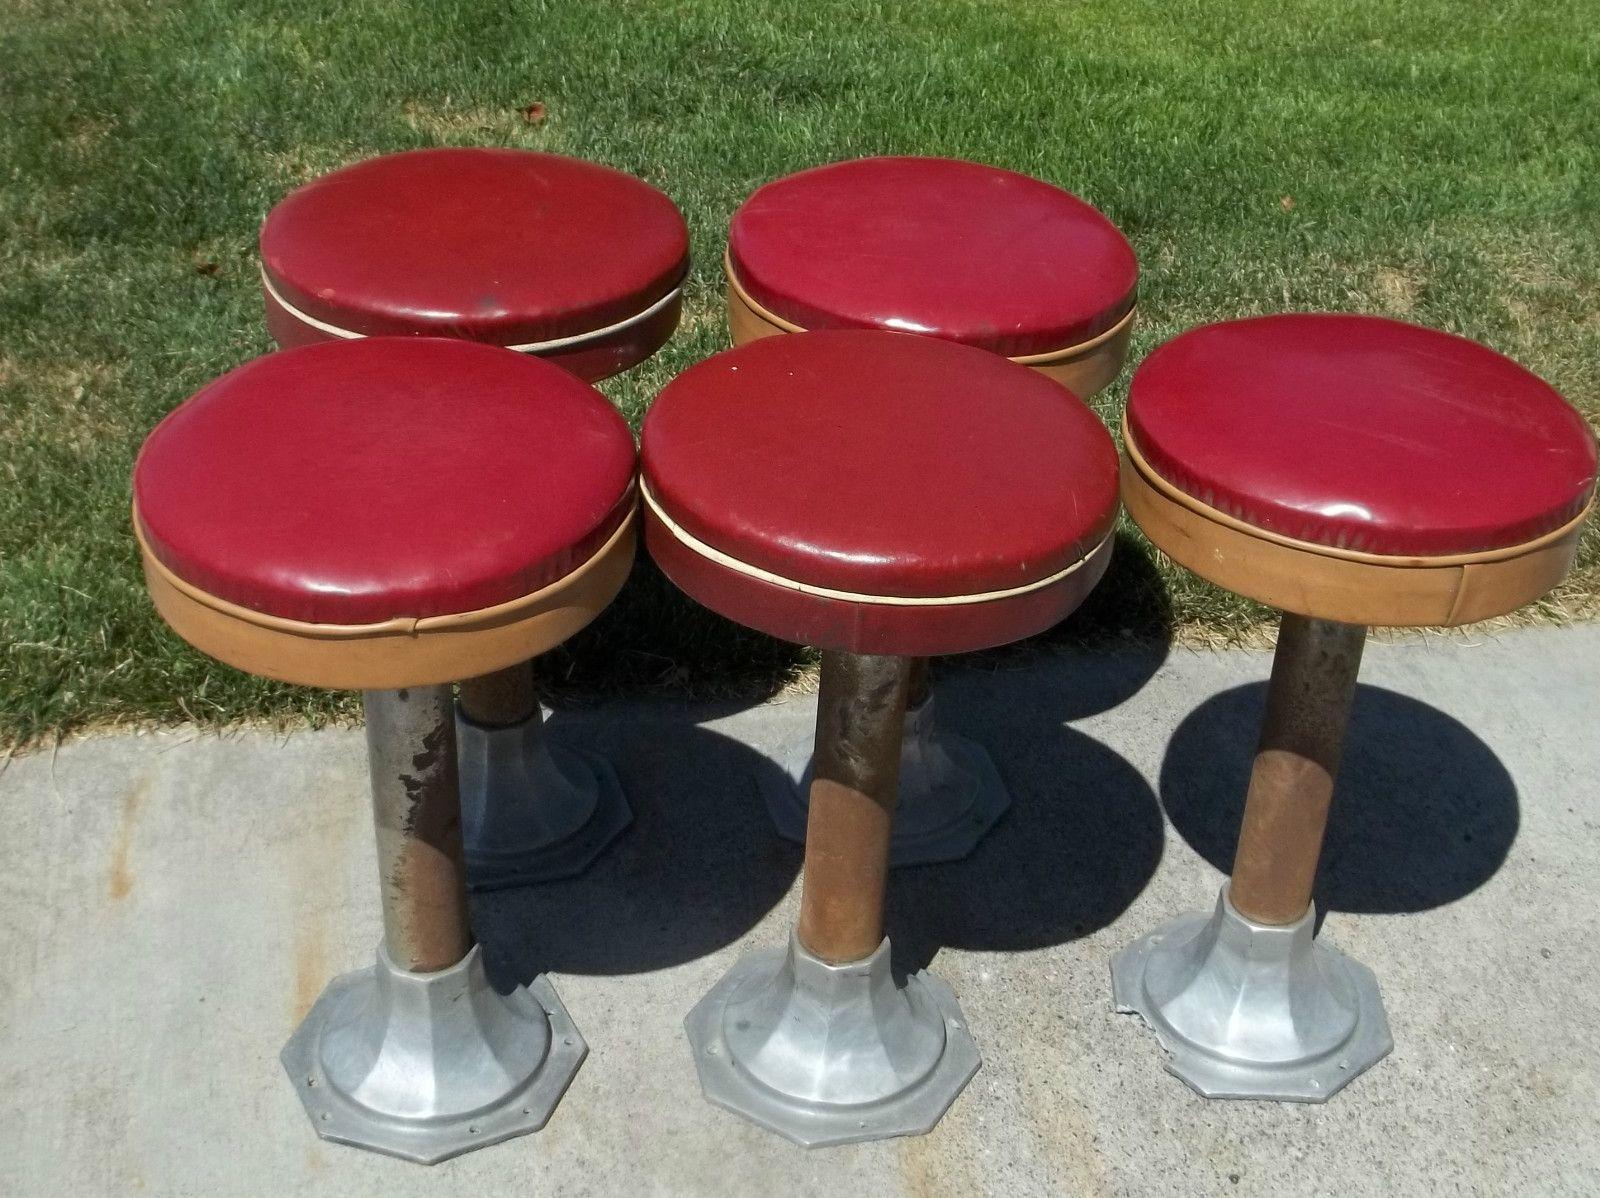 Astounding 1940S 1950S Soda Fountain Bar Stools Swivel Seat Cjindustries Chair Design For Home Cjindustriesco